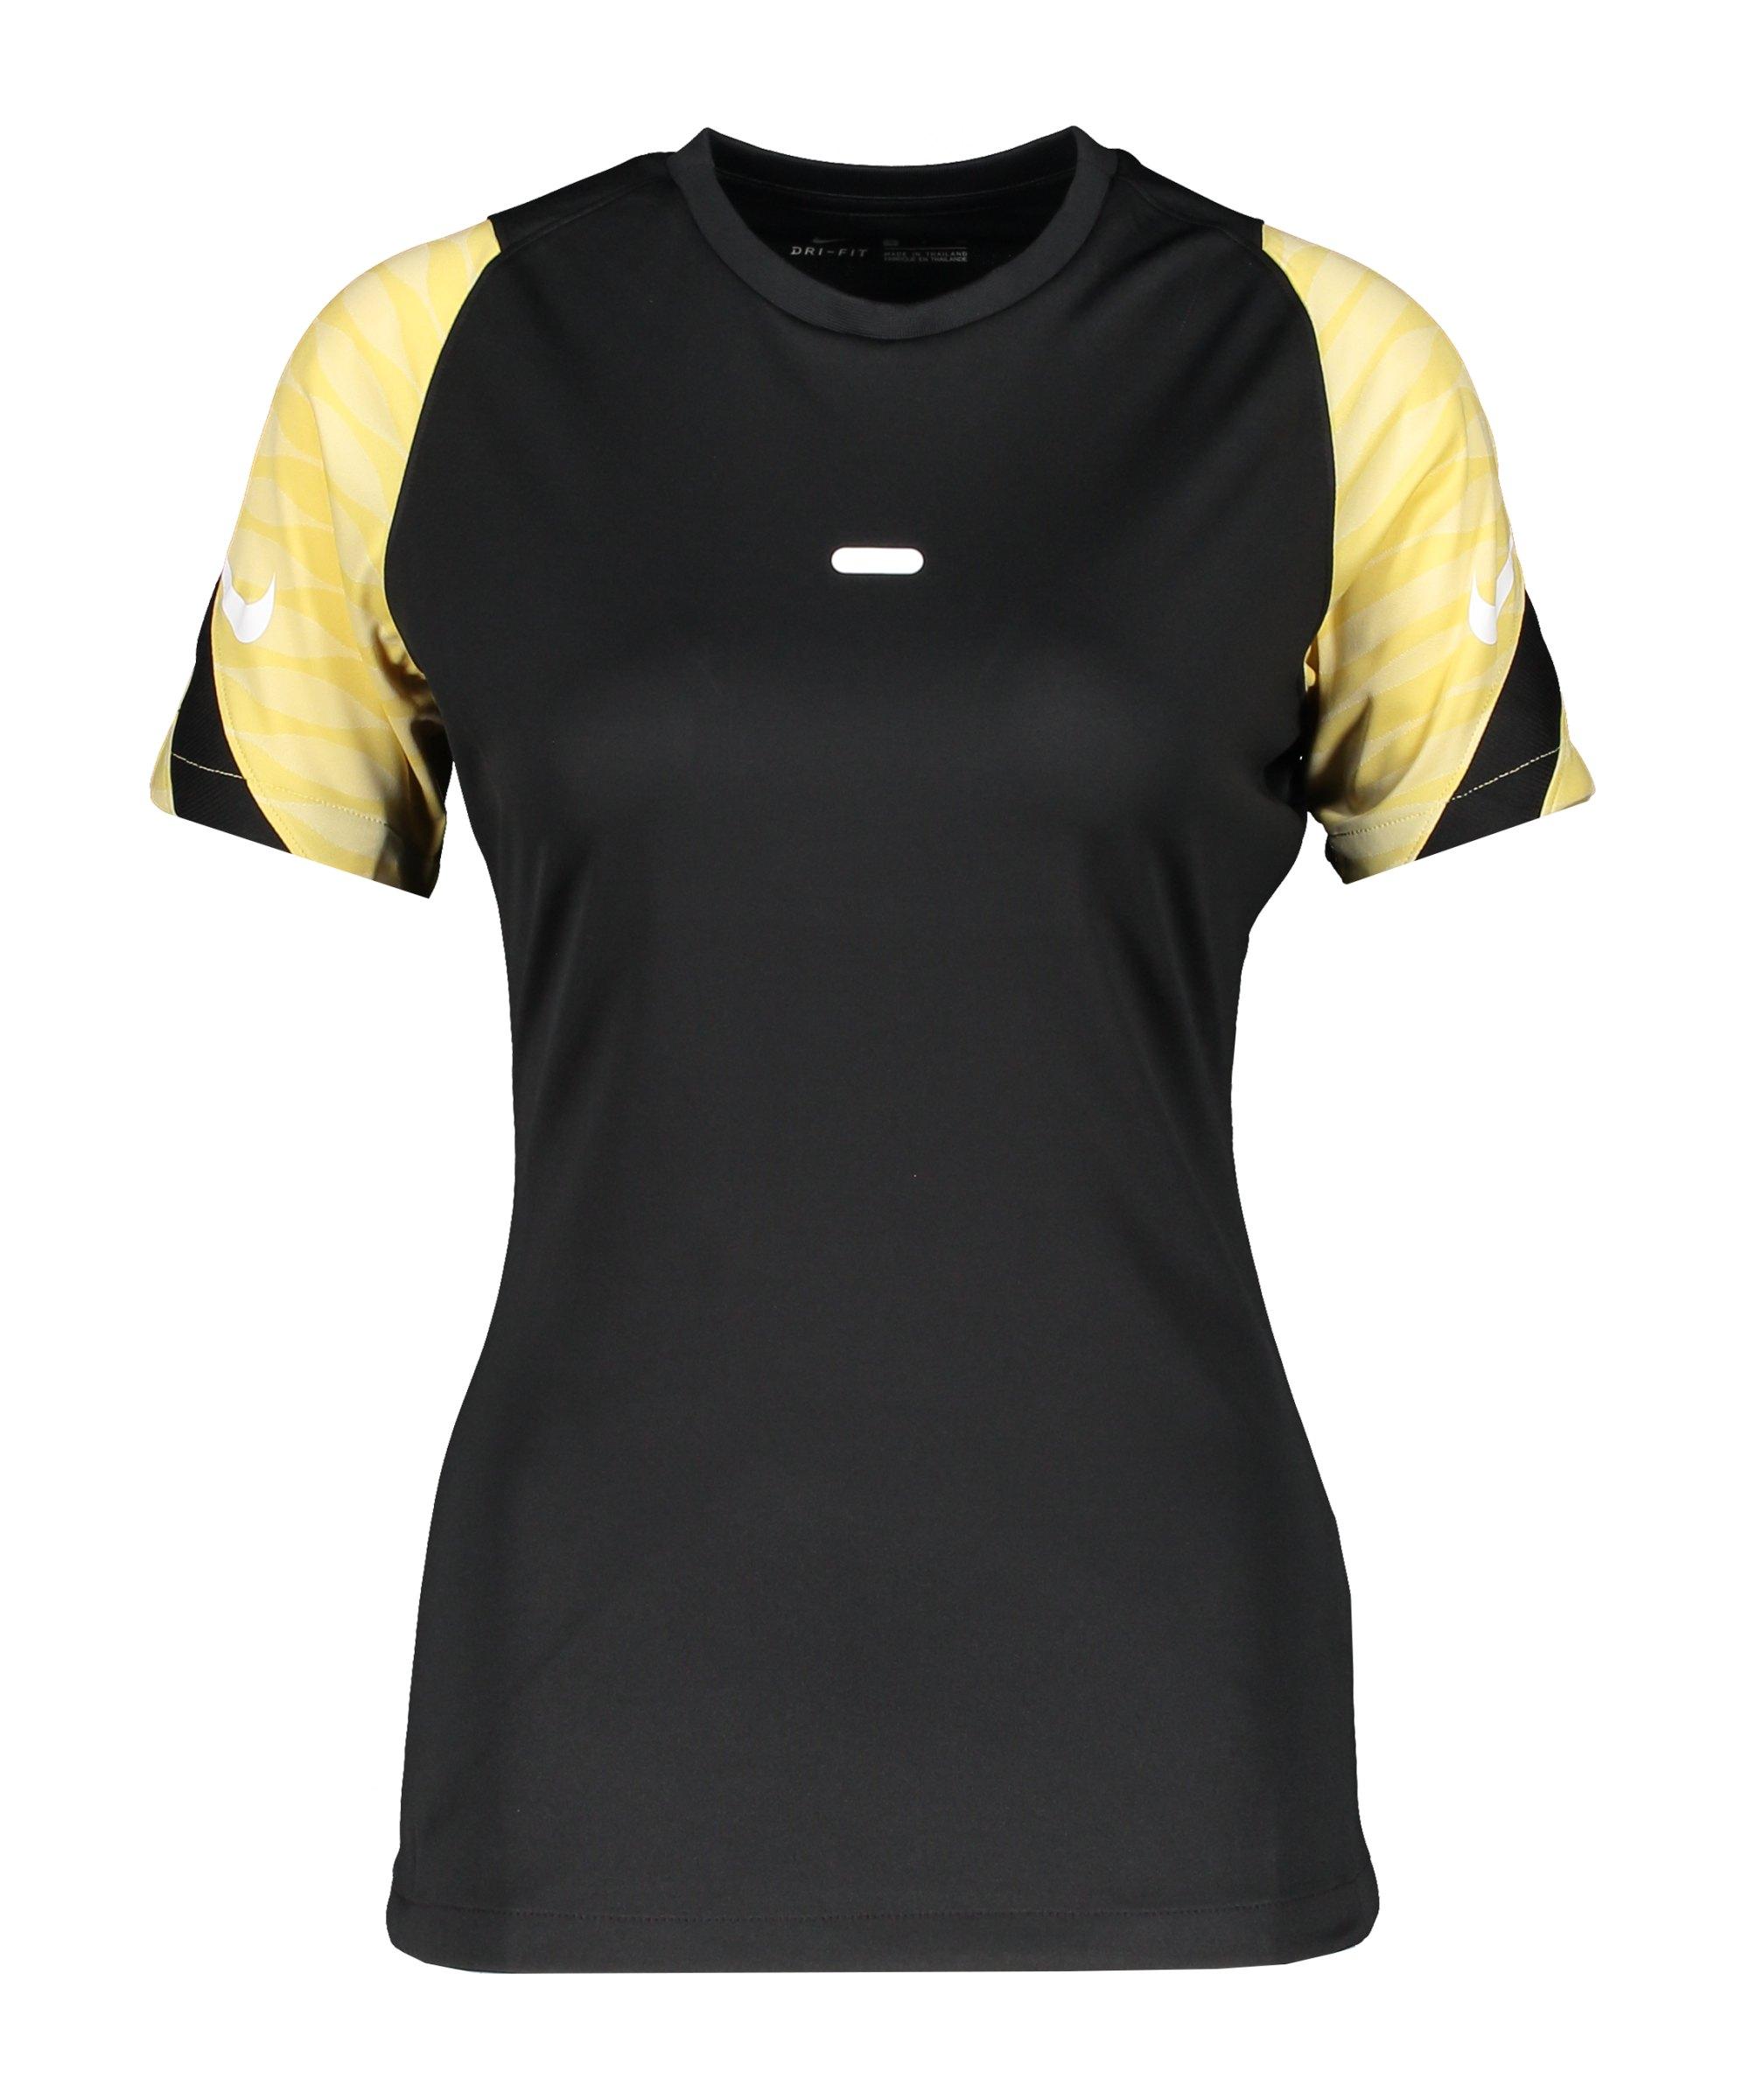 Nike Strike 21 T-Shirt Damen Schwarz Gold F011 - schwarz